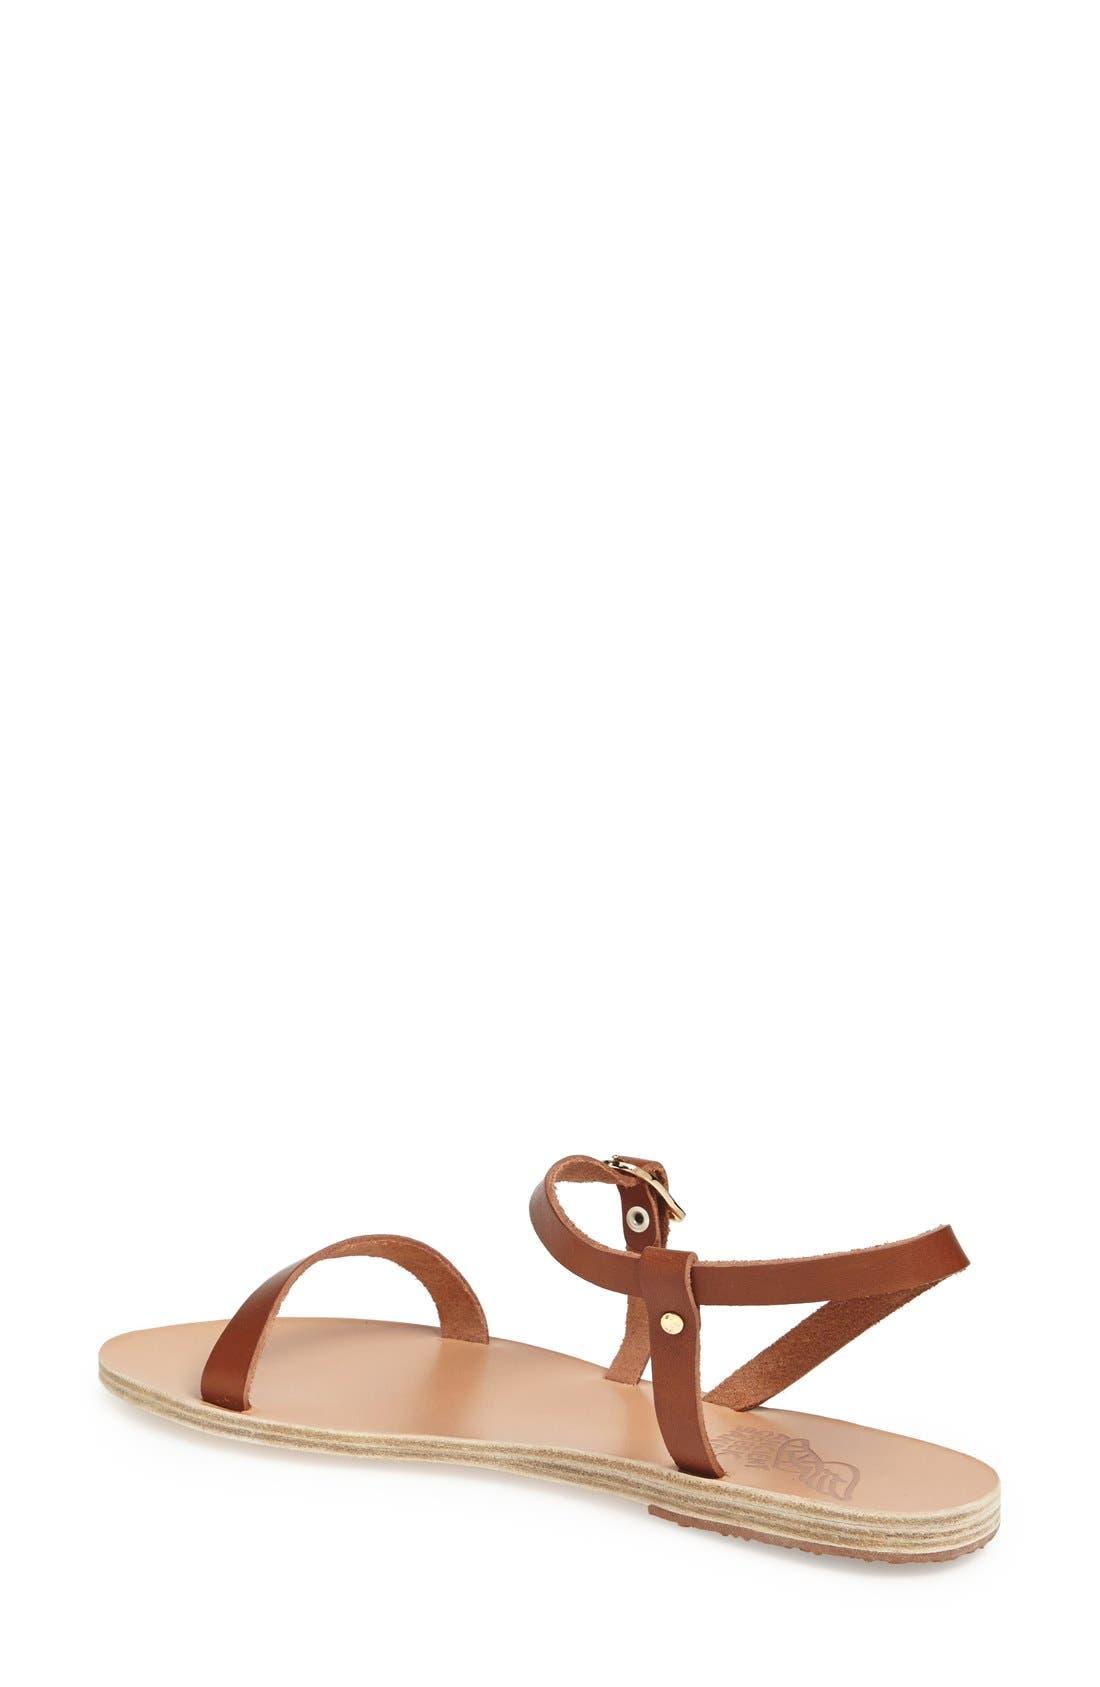 Alternate Image 2  - Ancient Greek Sandals 'Niove' Leather Sandal (Women)